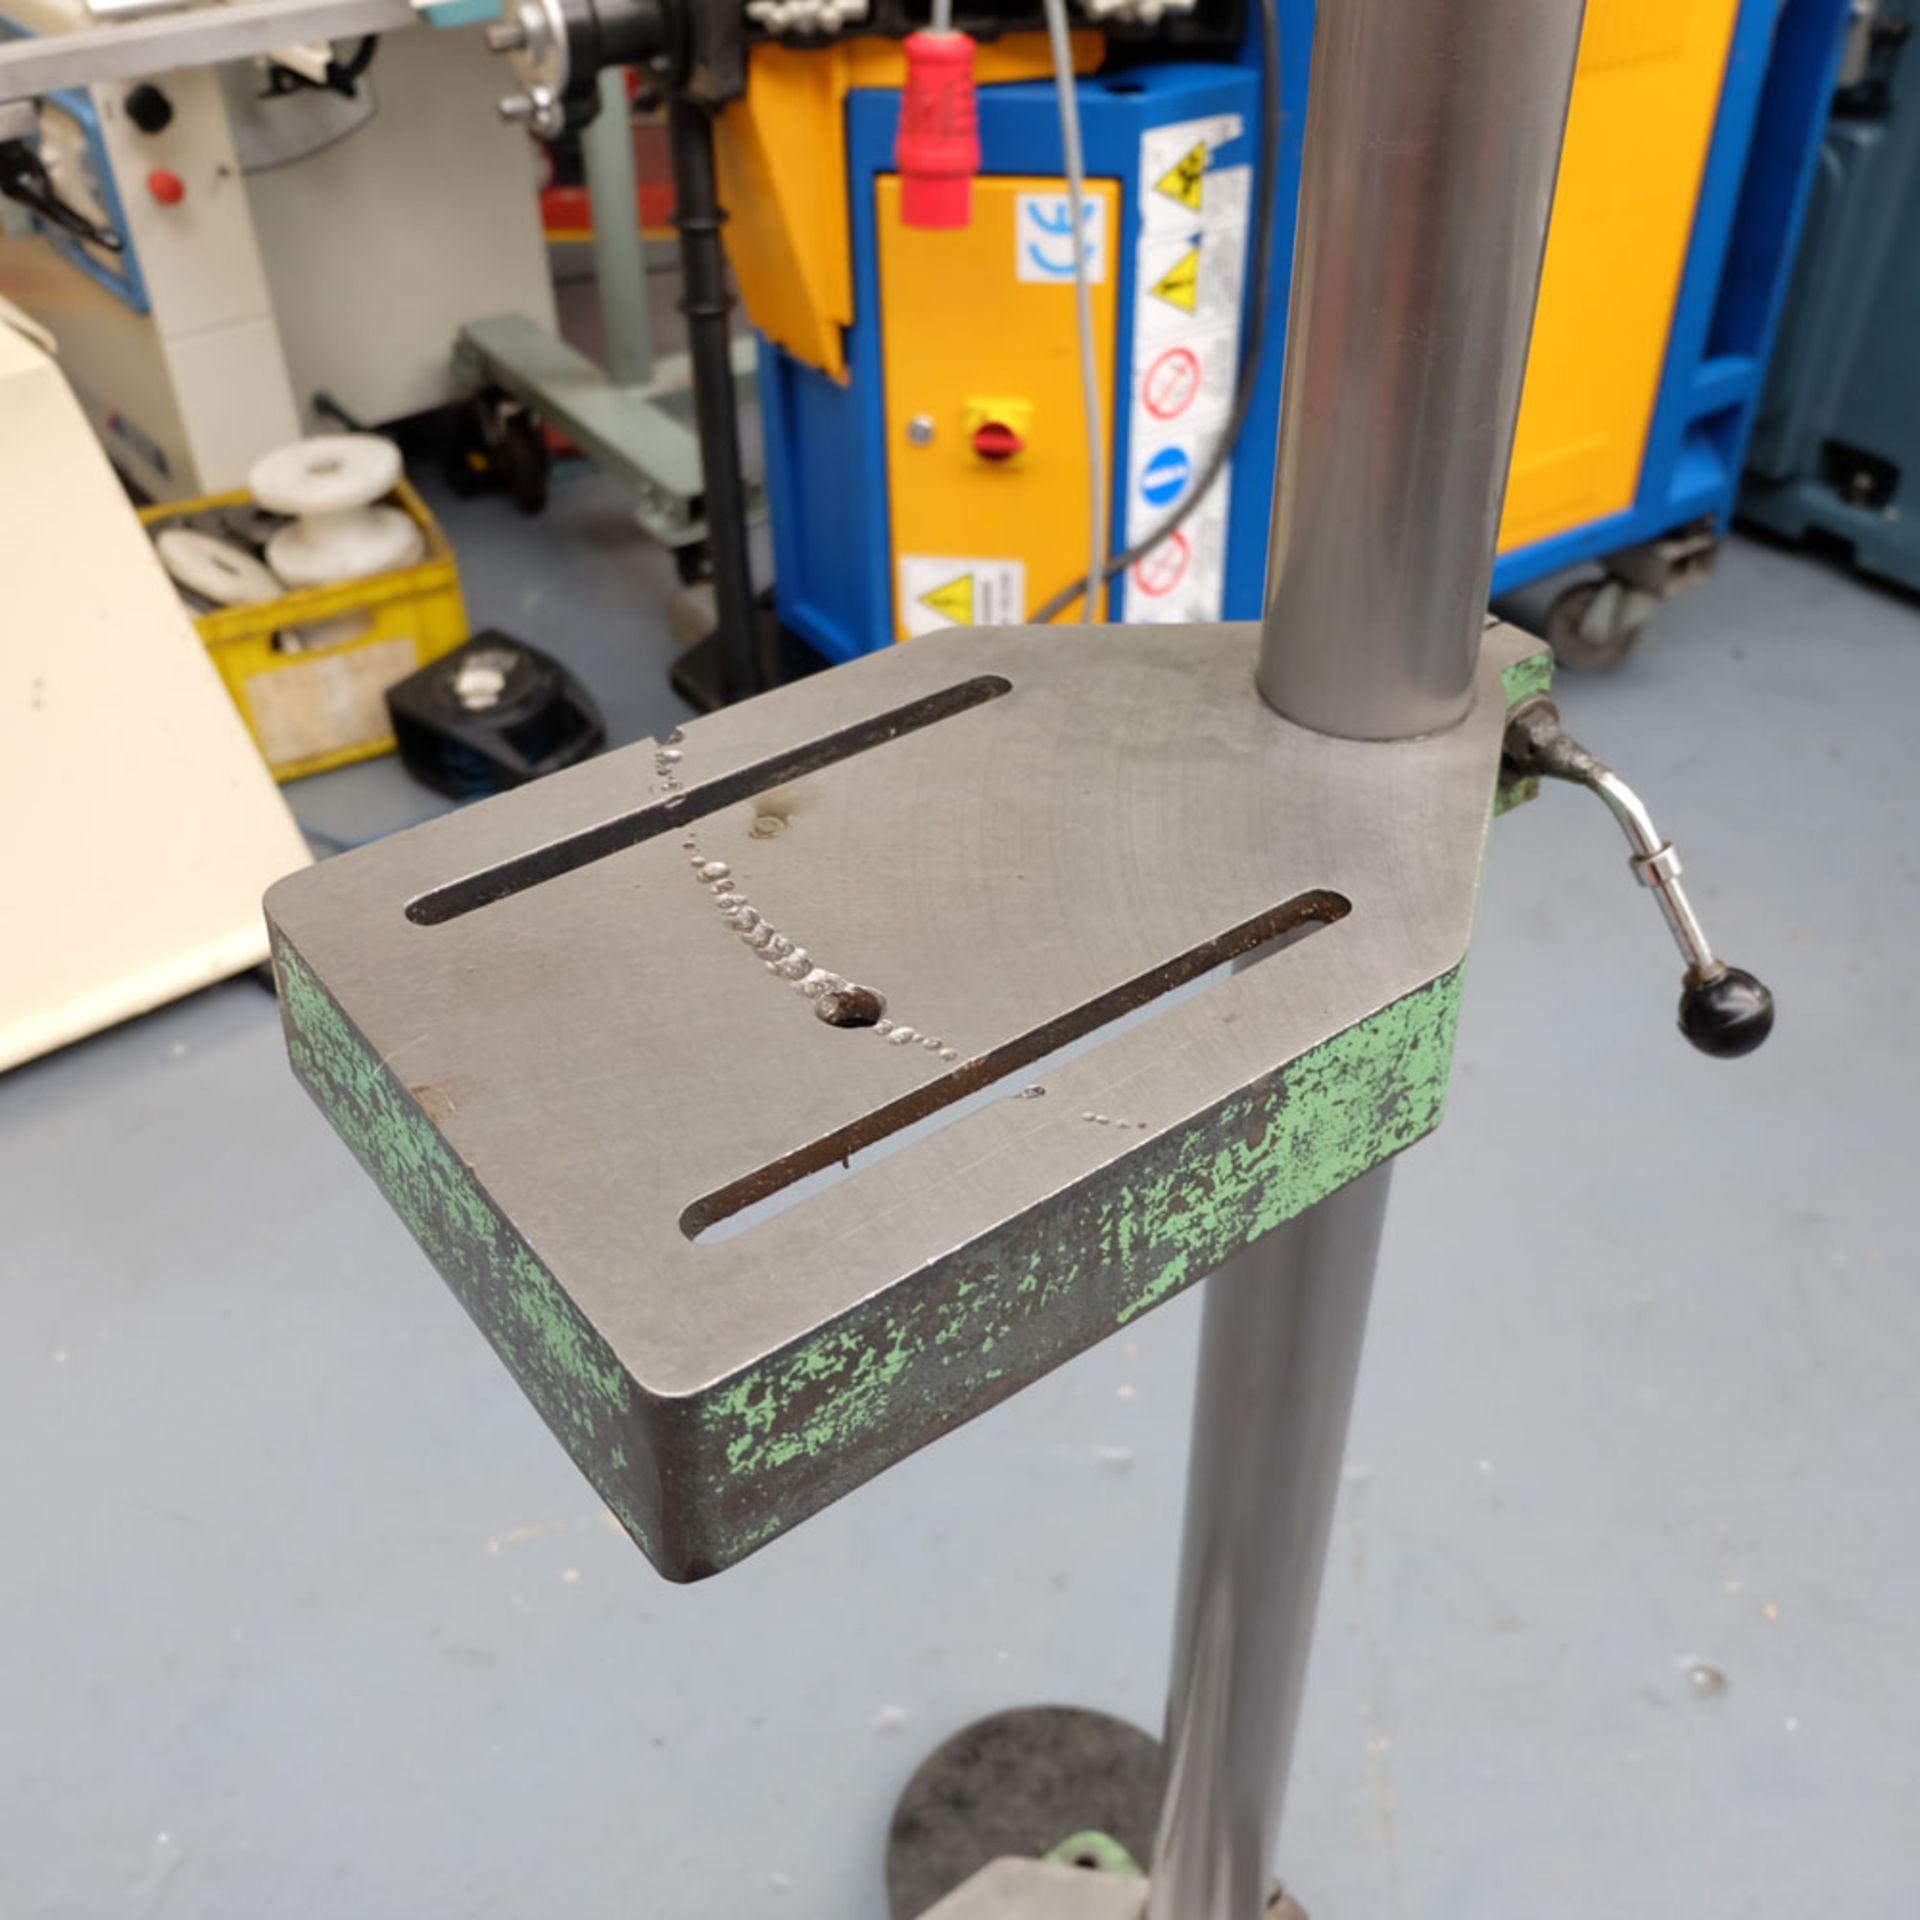 "Meddings Type Driltru Pillar Drill. Capacity 1/2"". 5 Speeds 500 - 4000rpm. - Image 5 of 7"